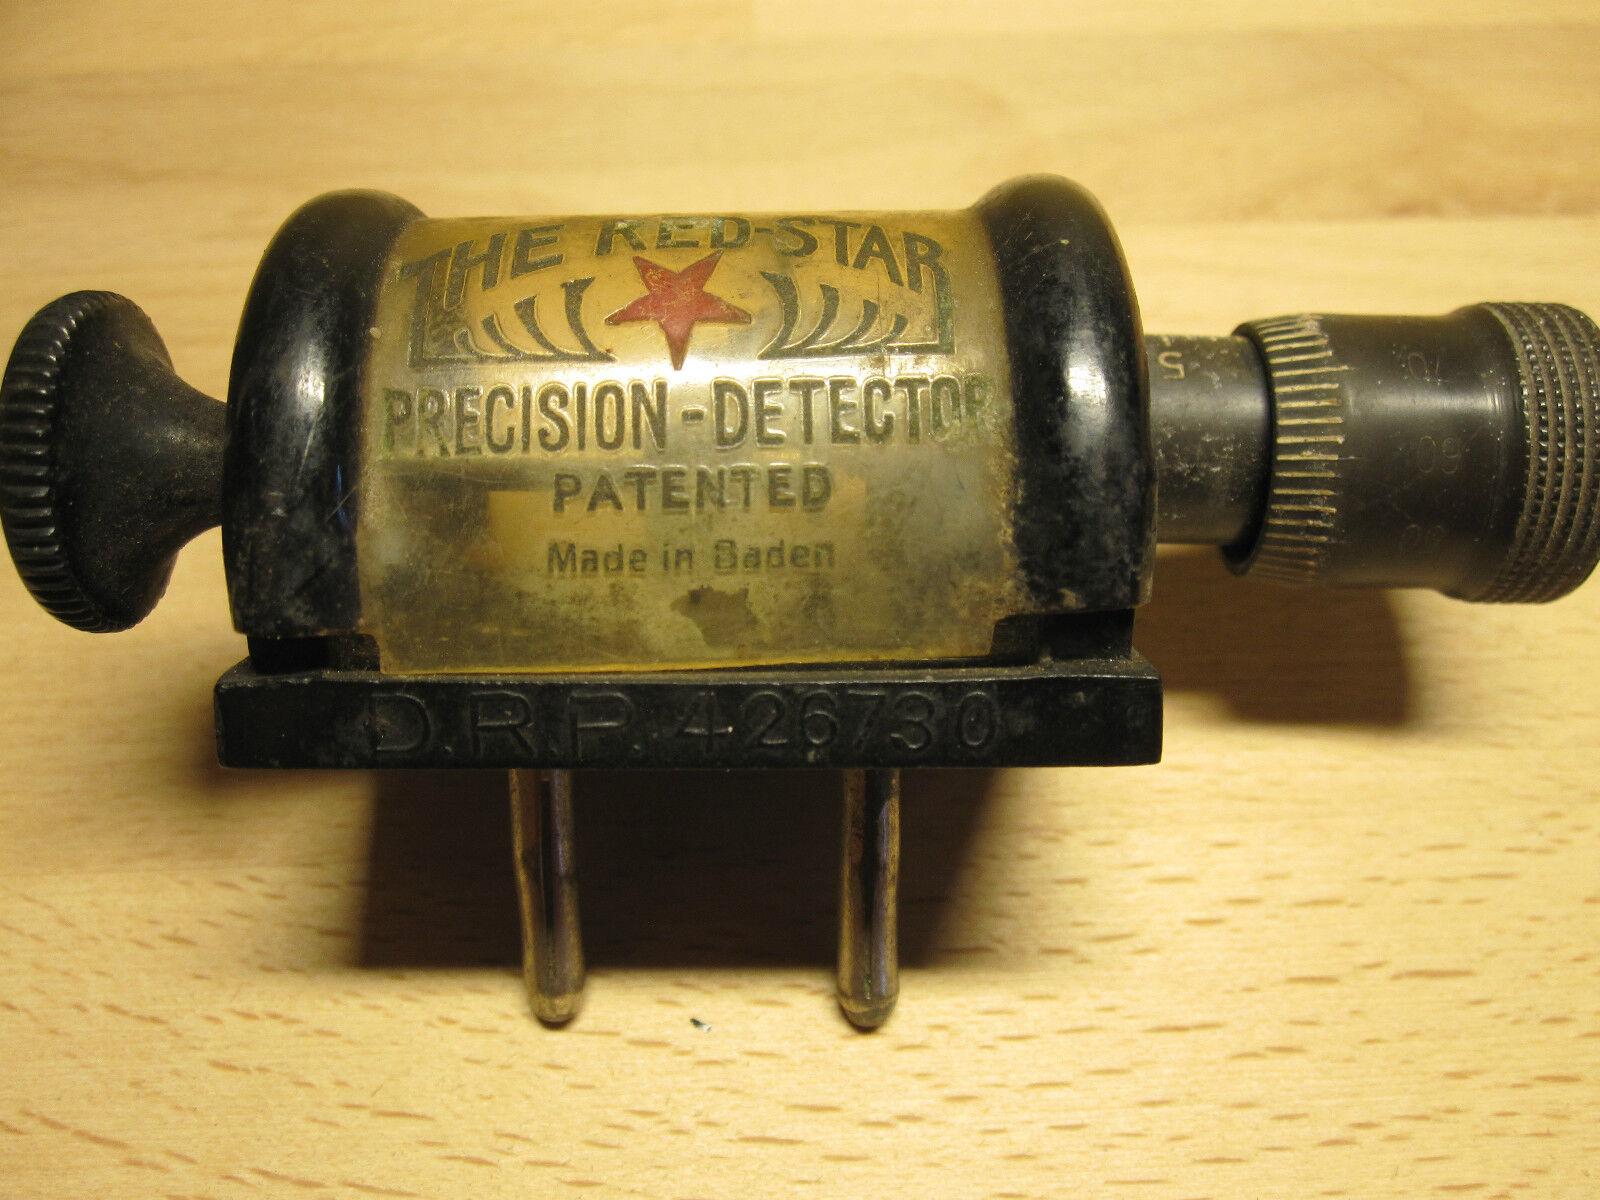 Image 1 - Detector-Receiver-Red-Star-Precision-Detector-CRYSTAL-RADIO-1920-039-s-Baden-1920s